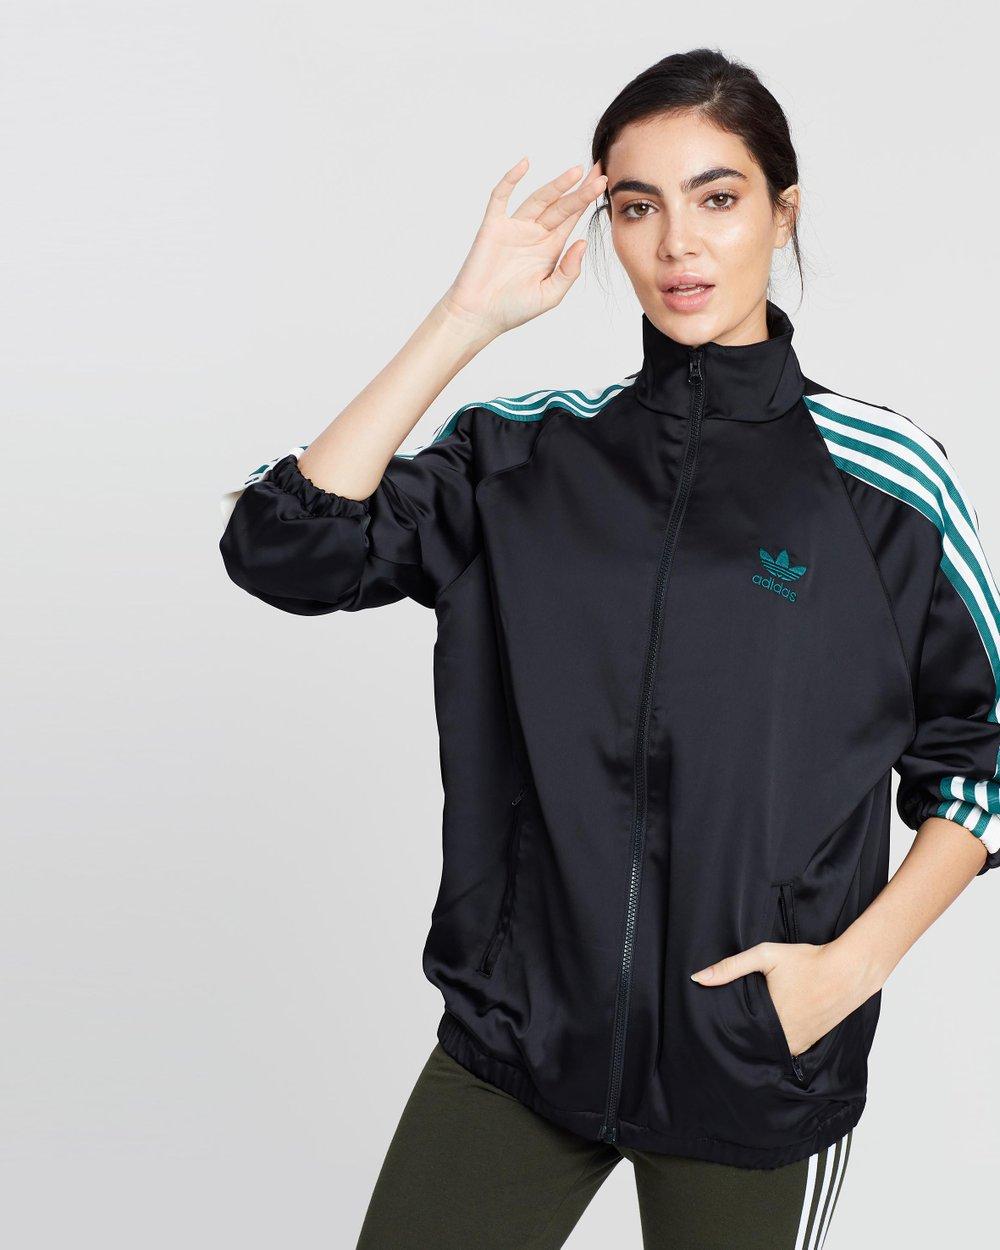 838368c818e8c Adibreak Satin Track Top - Women's by adidas Originals Online | THE ICONIC  | Australia